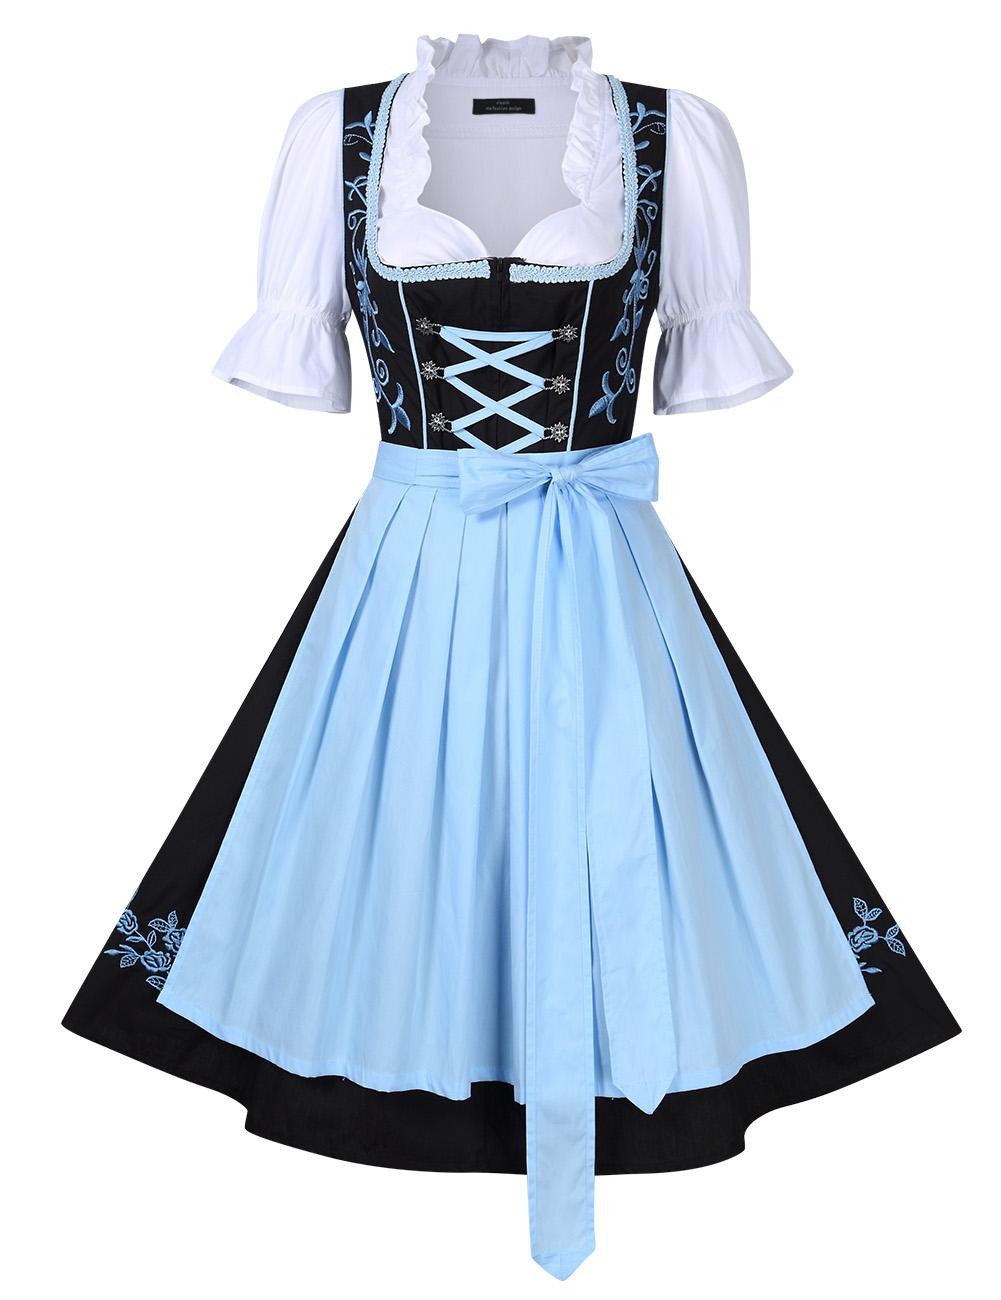 [EU Direct] Women's Beer Festival Stylish Dress Suit Short Sleeve A Swing Holiday Party Dress for Oktoberfest